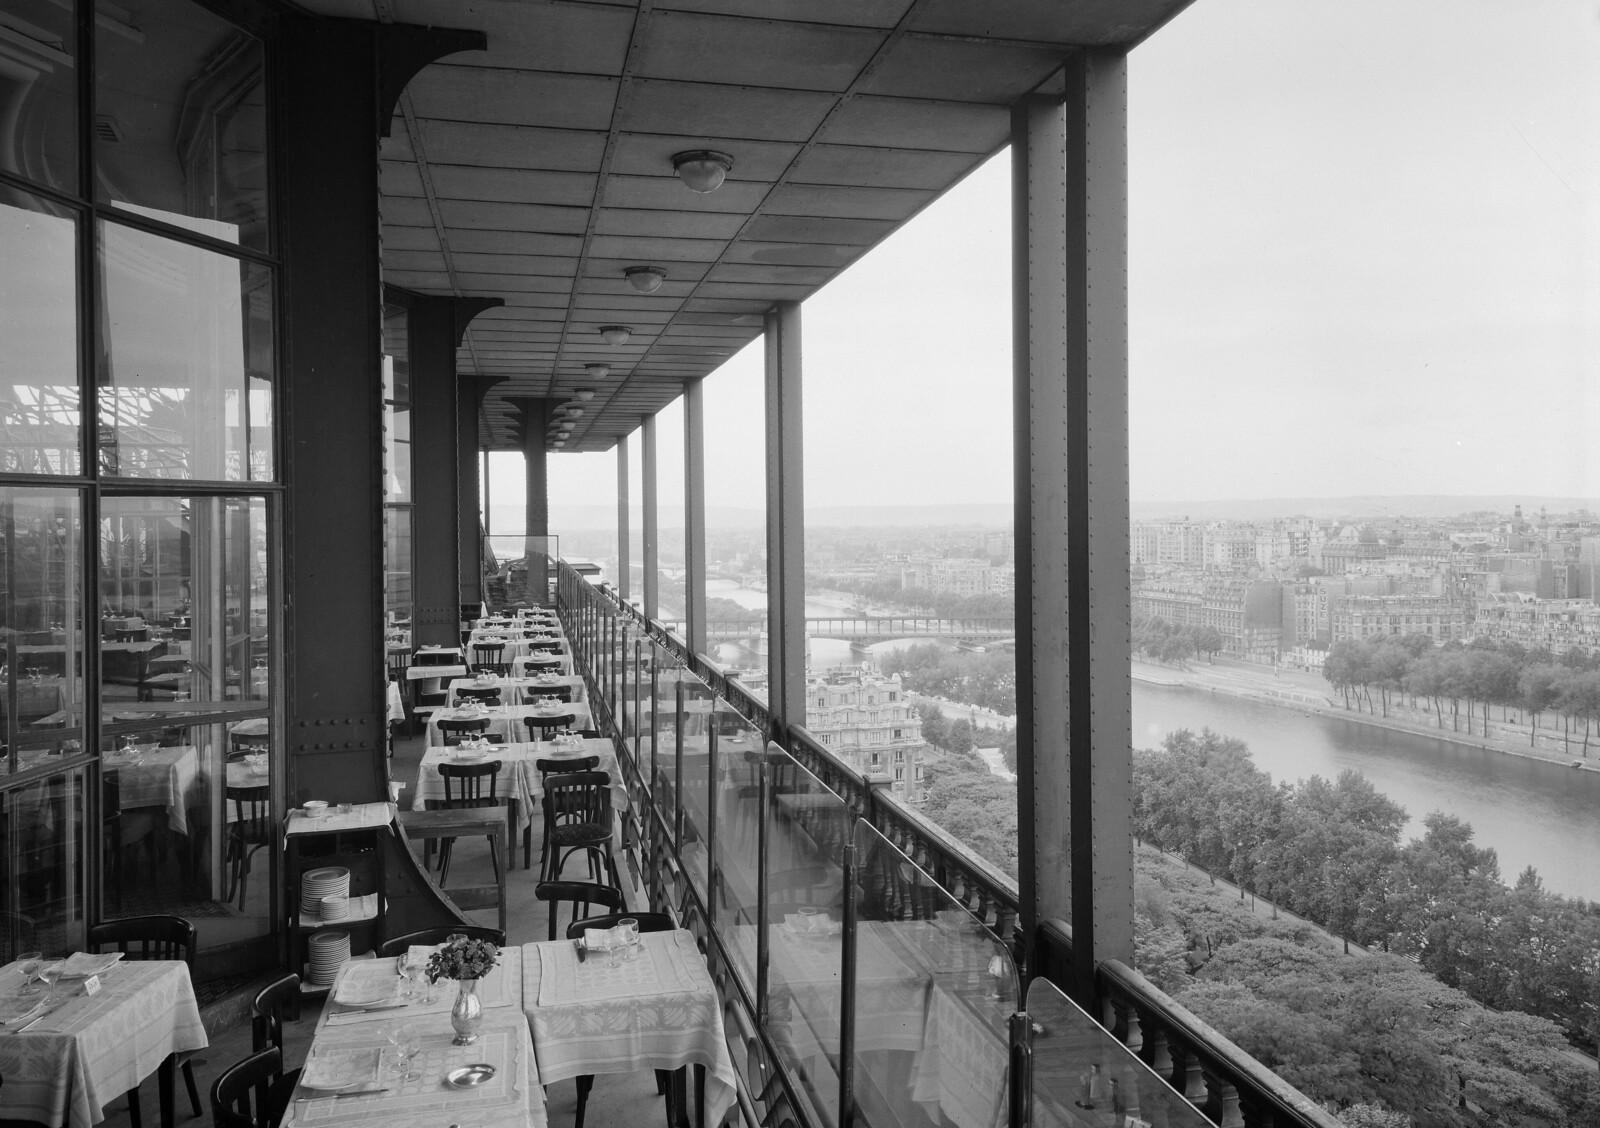 10. Эйфелева башня. Терраса ресторана на втором этаже с видом на Сену (2)